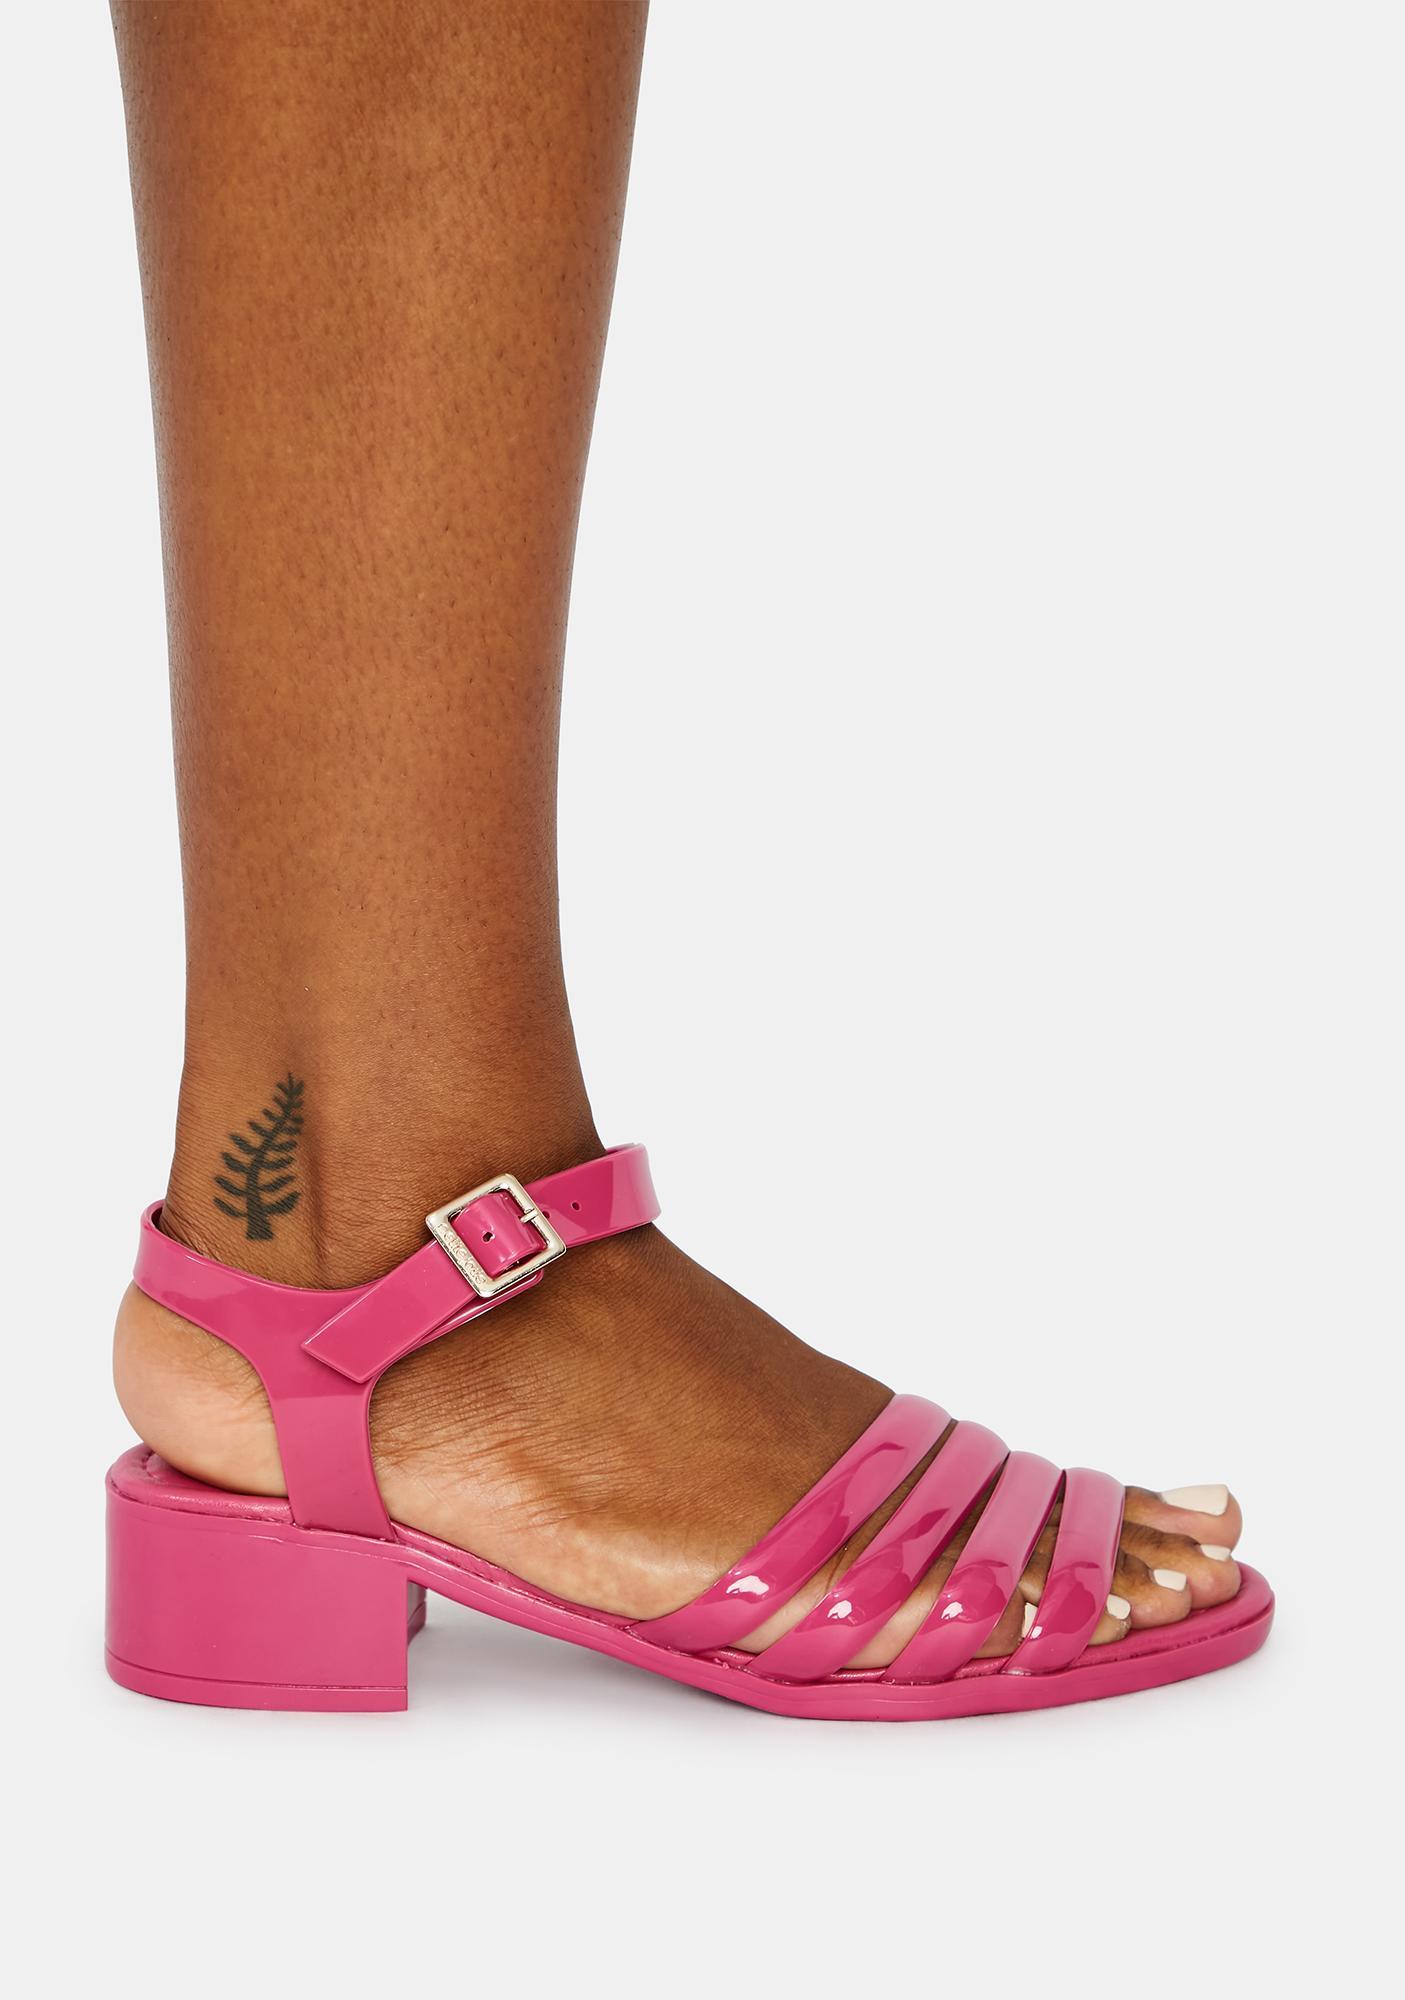 Petite Jolie Flirty York Jelly Sandals